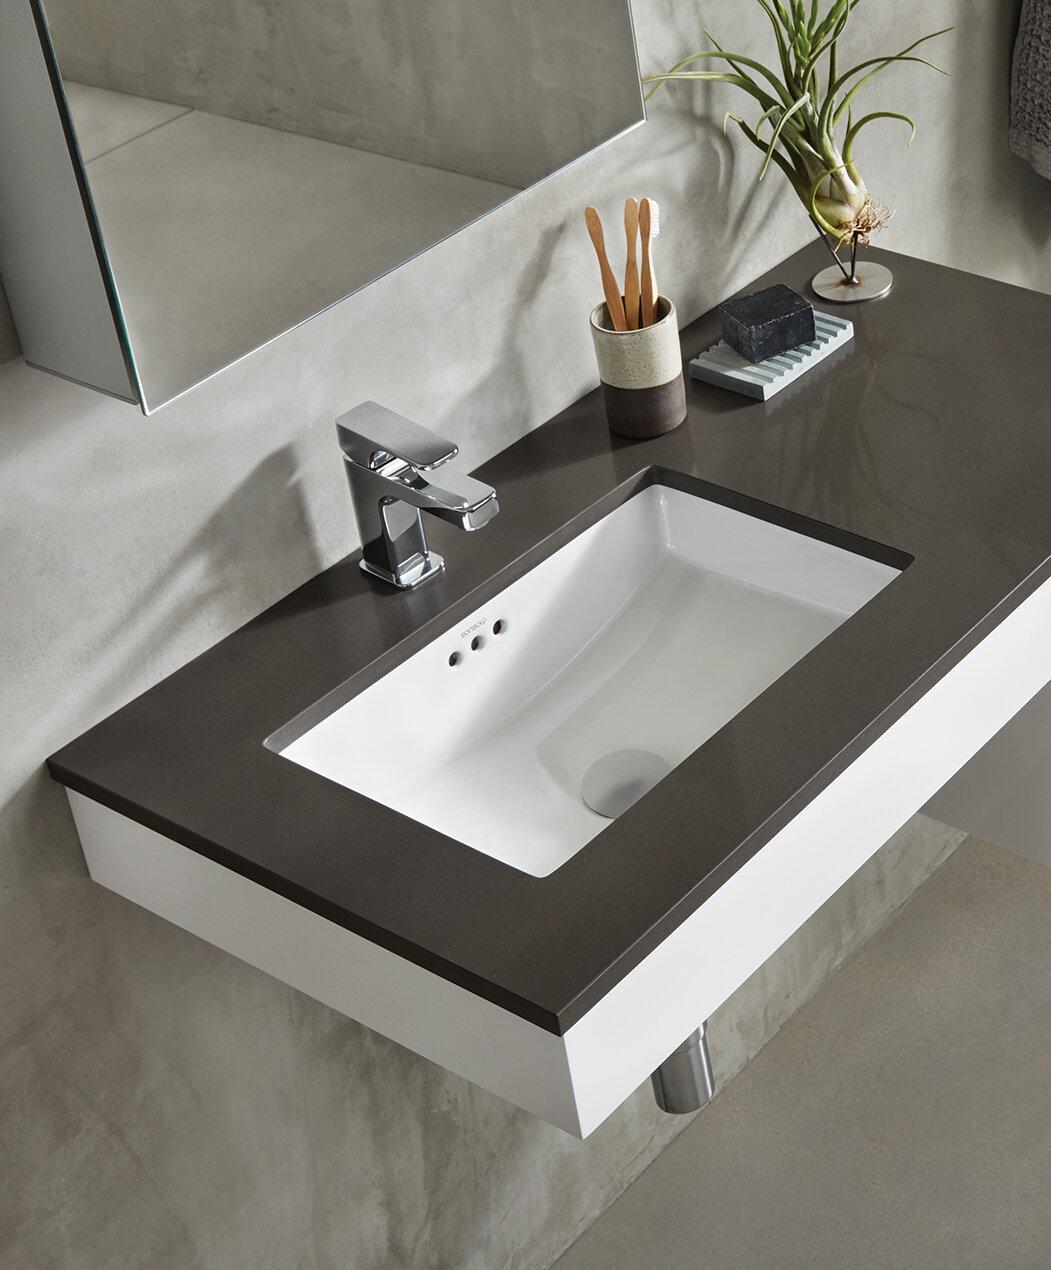 Ronbow essence ceramic rectangular undermount bathroom sink with overflow reviews wayfair